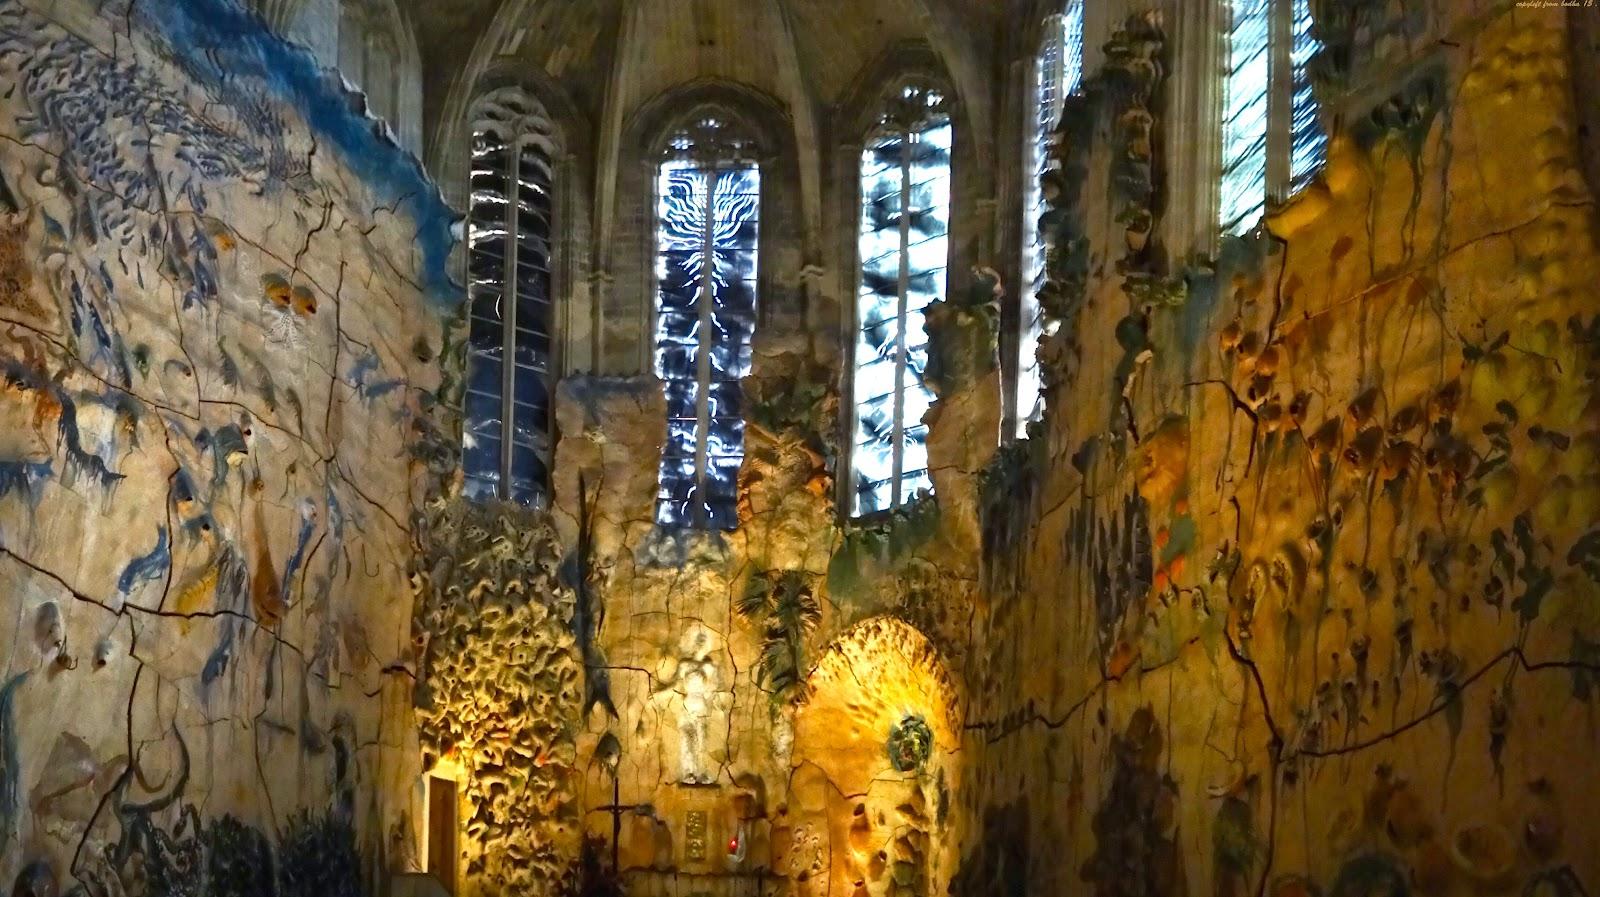 La vieille ville de Palma de Majorque La cathédrale Via Gallica